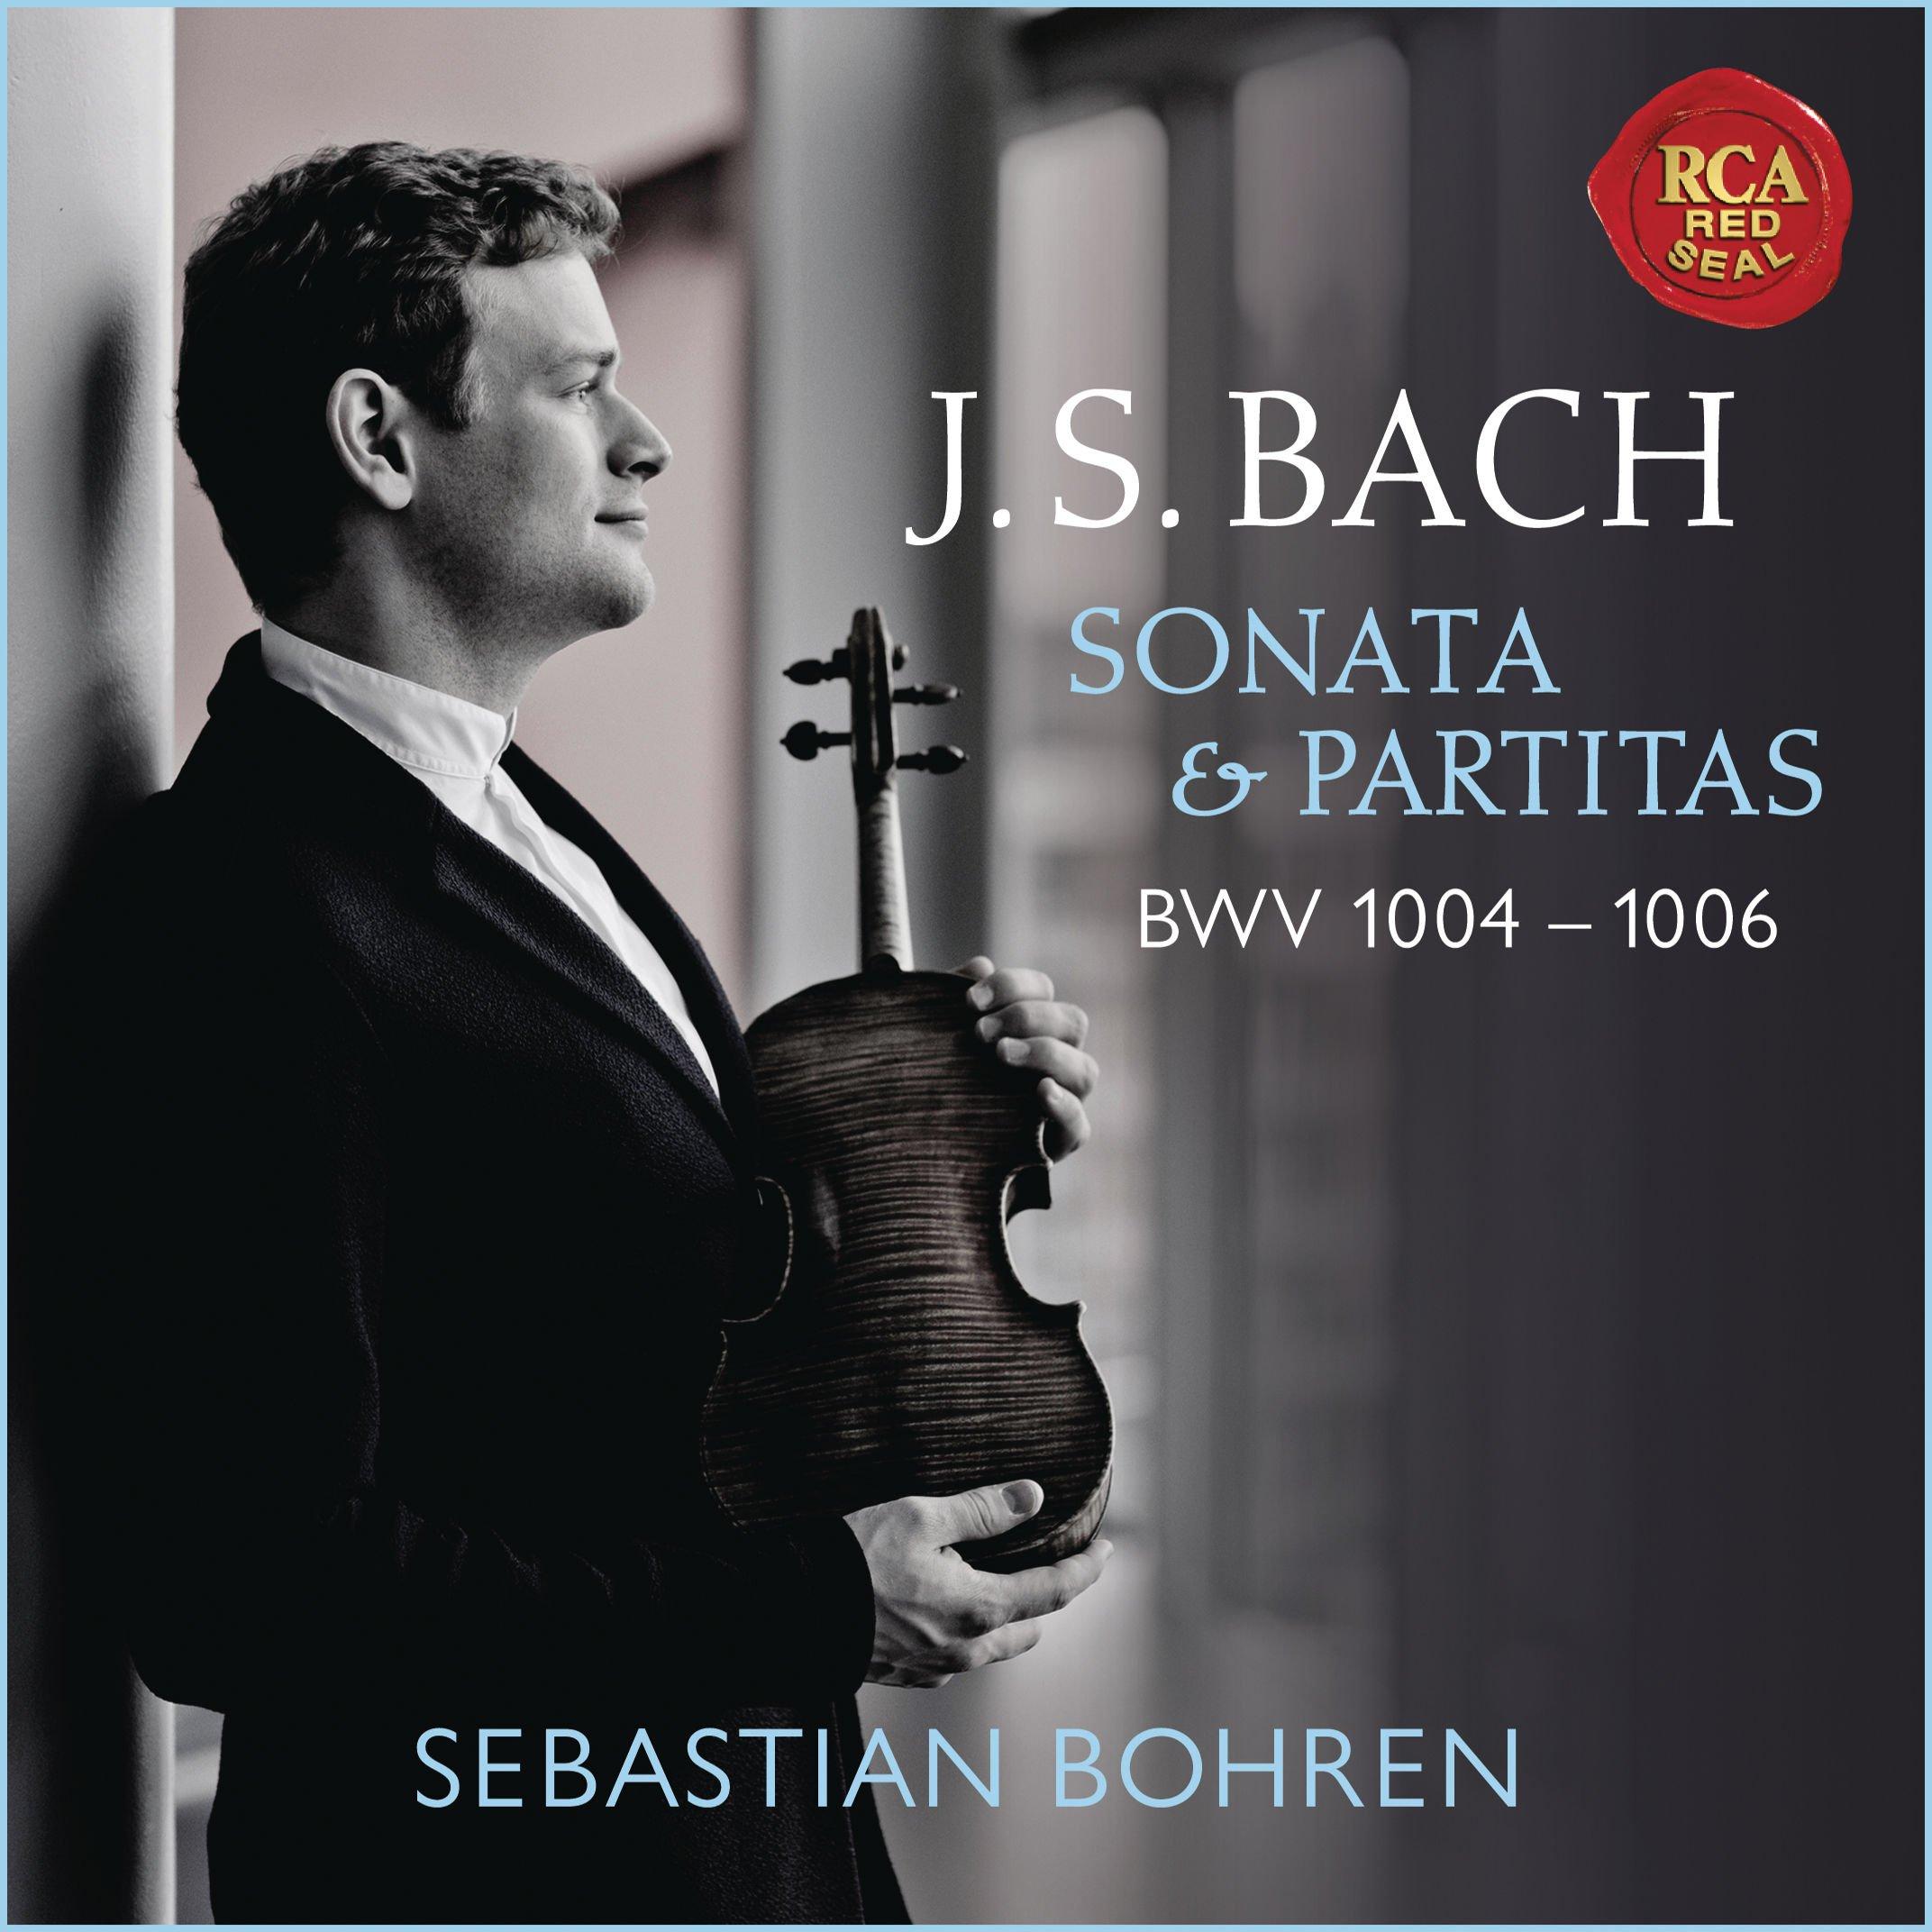 Download Sebastian Bohren - Bach Violin Sonata & Partitas 2018 FLAC